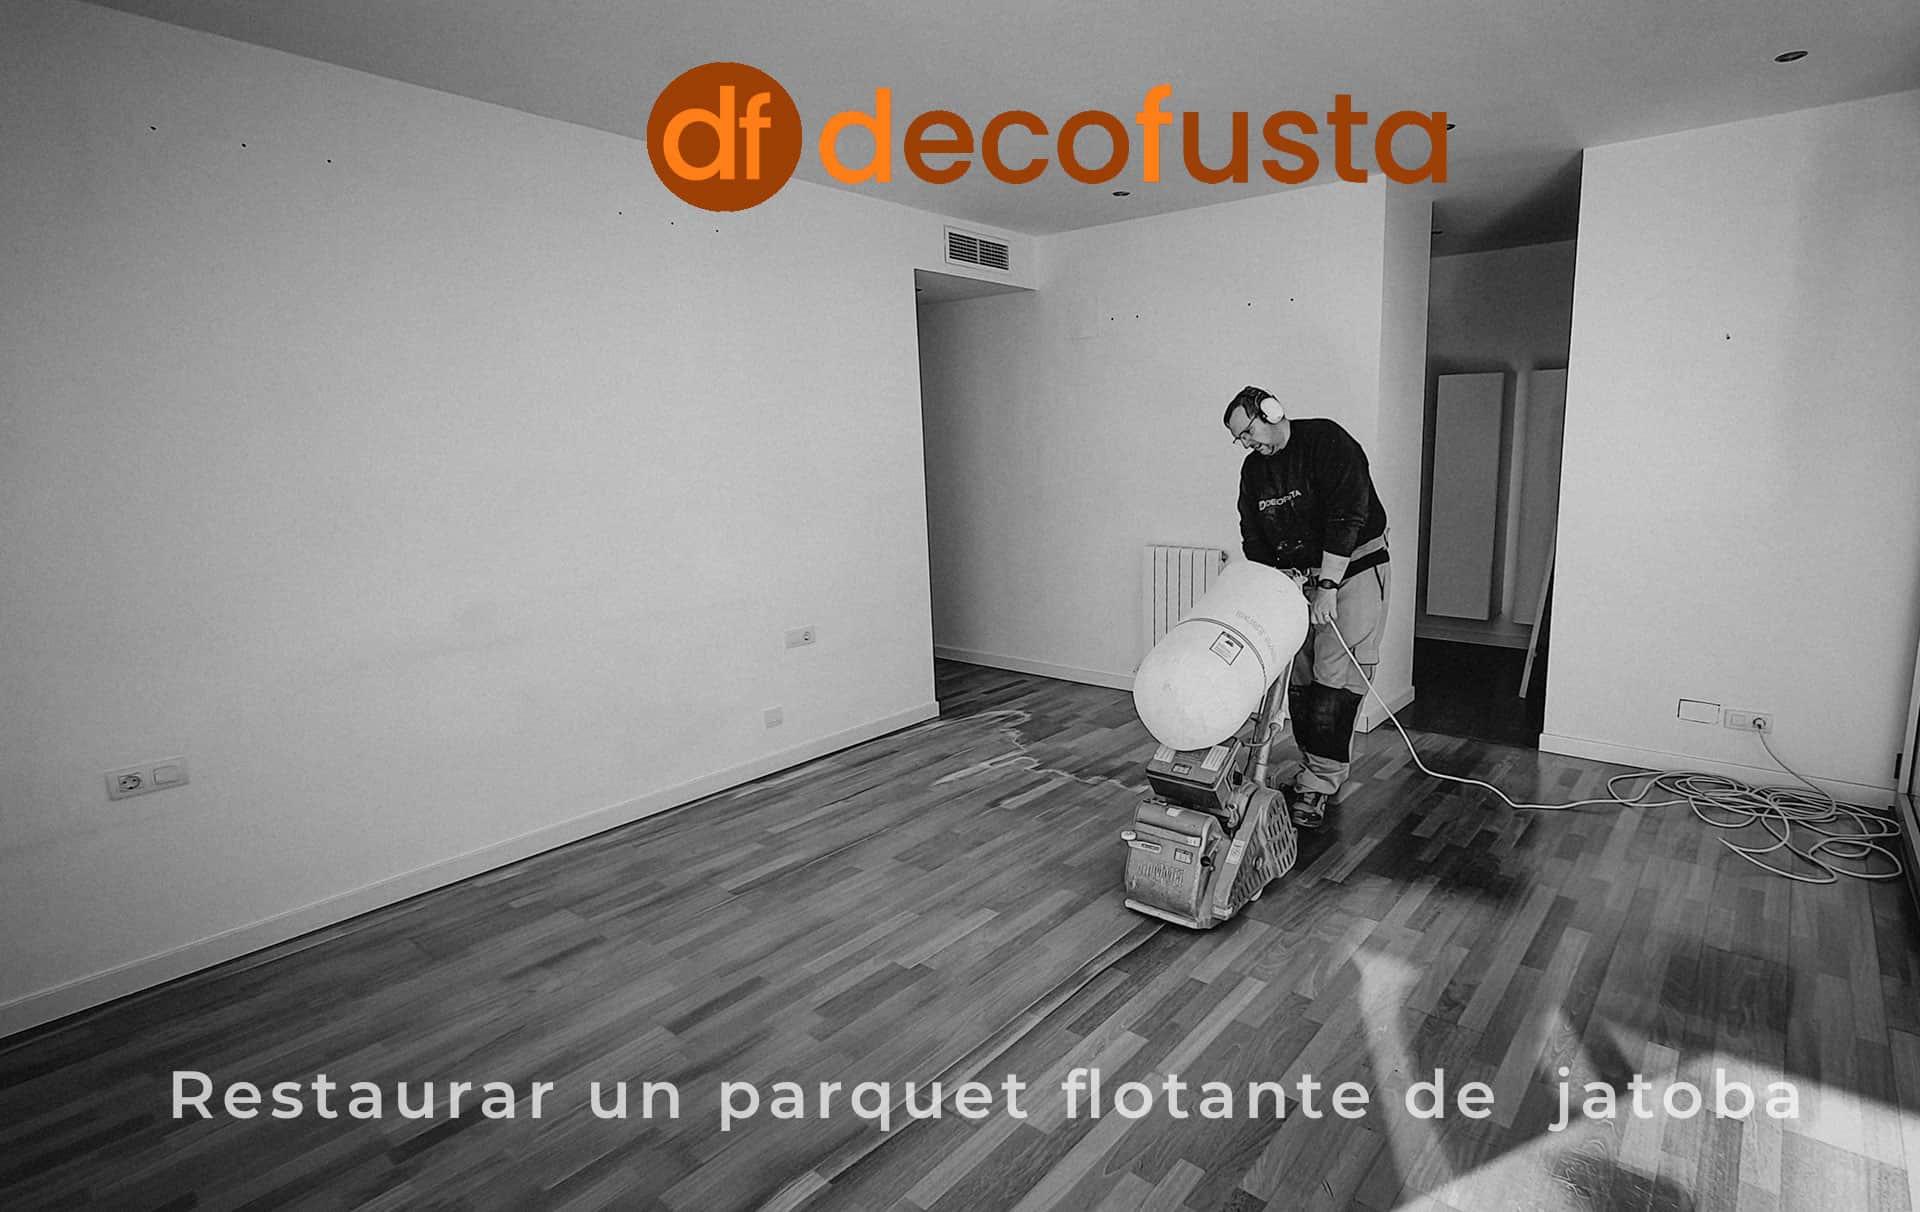 Restaurar un parquet flotante de jatoba